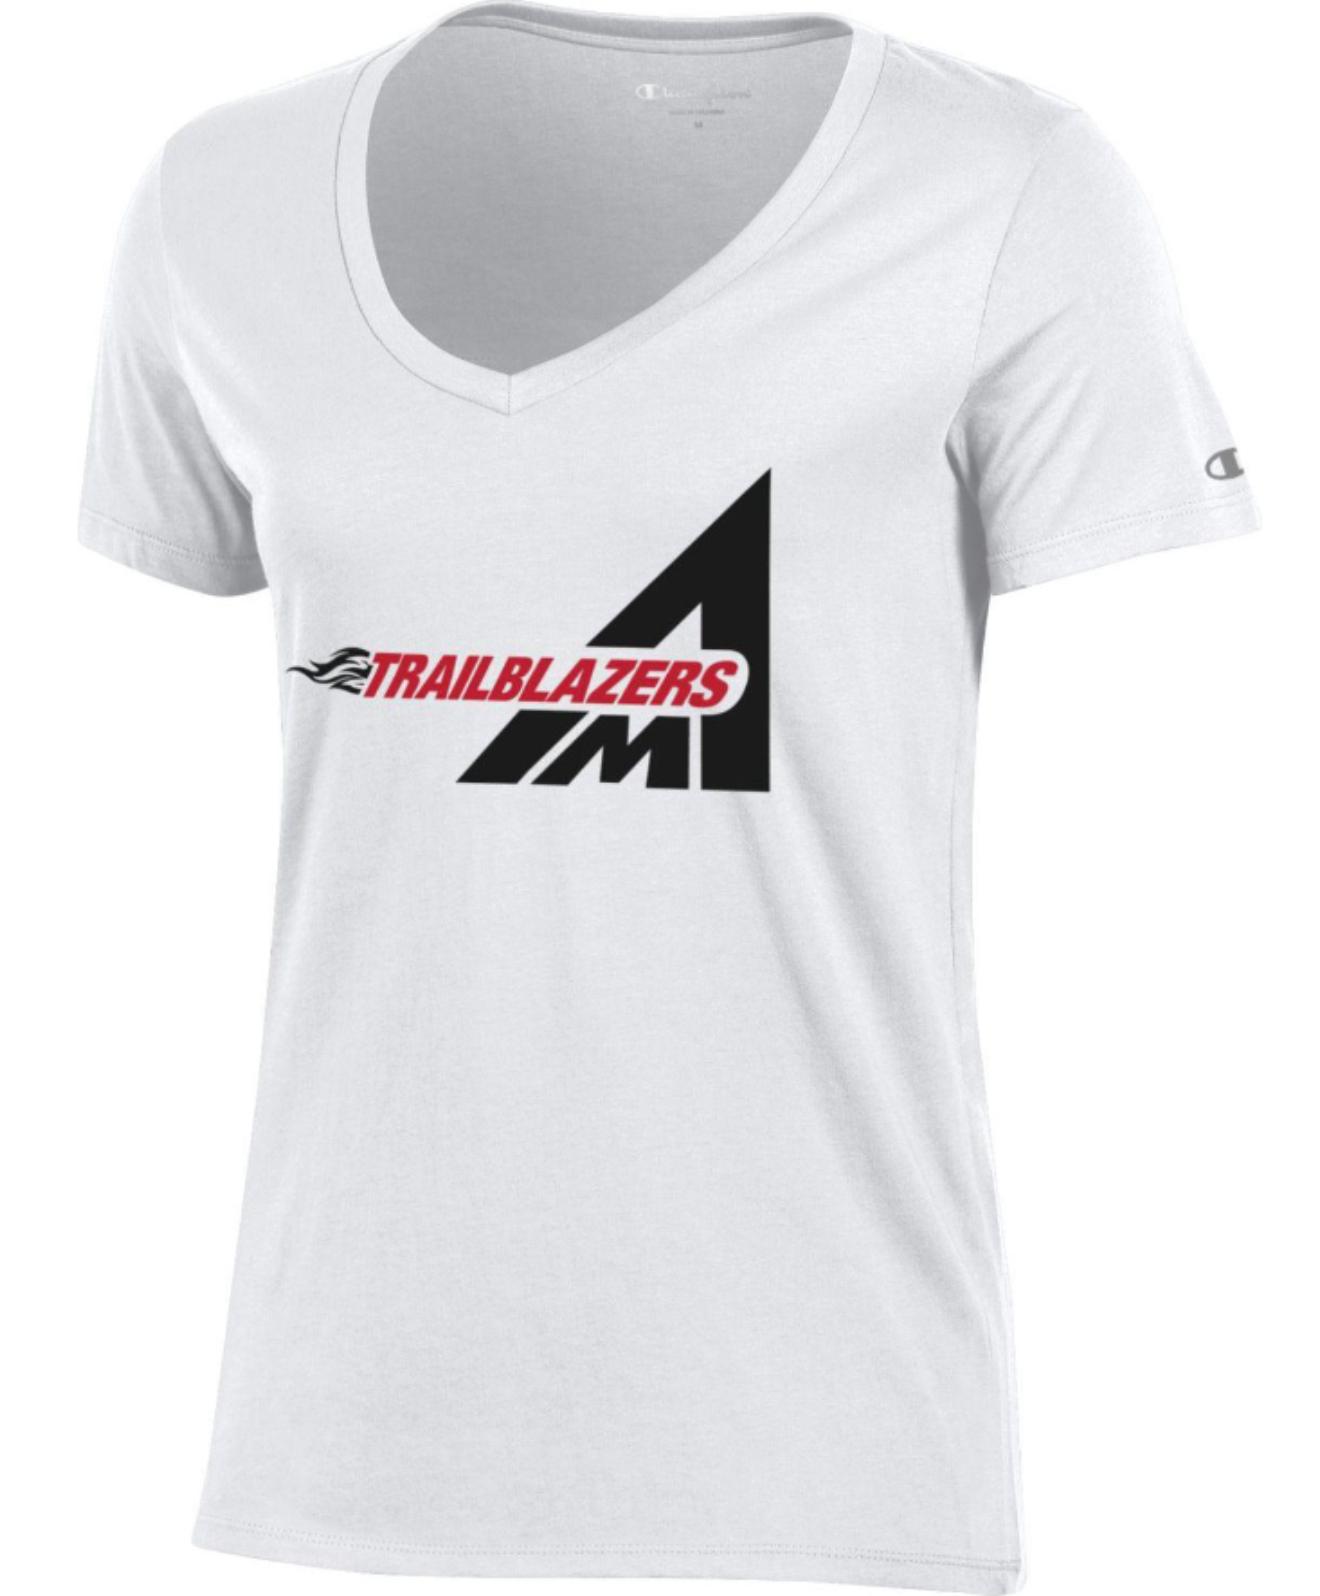 Atlanta Metropolitan State College Trailblazers Women's V-Neck Short Sleeve T-Shirt